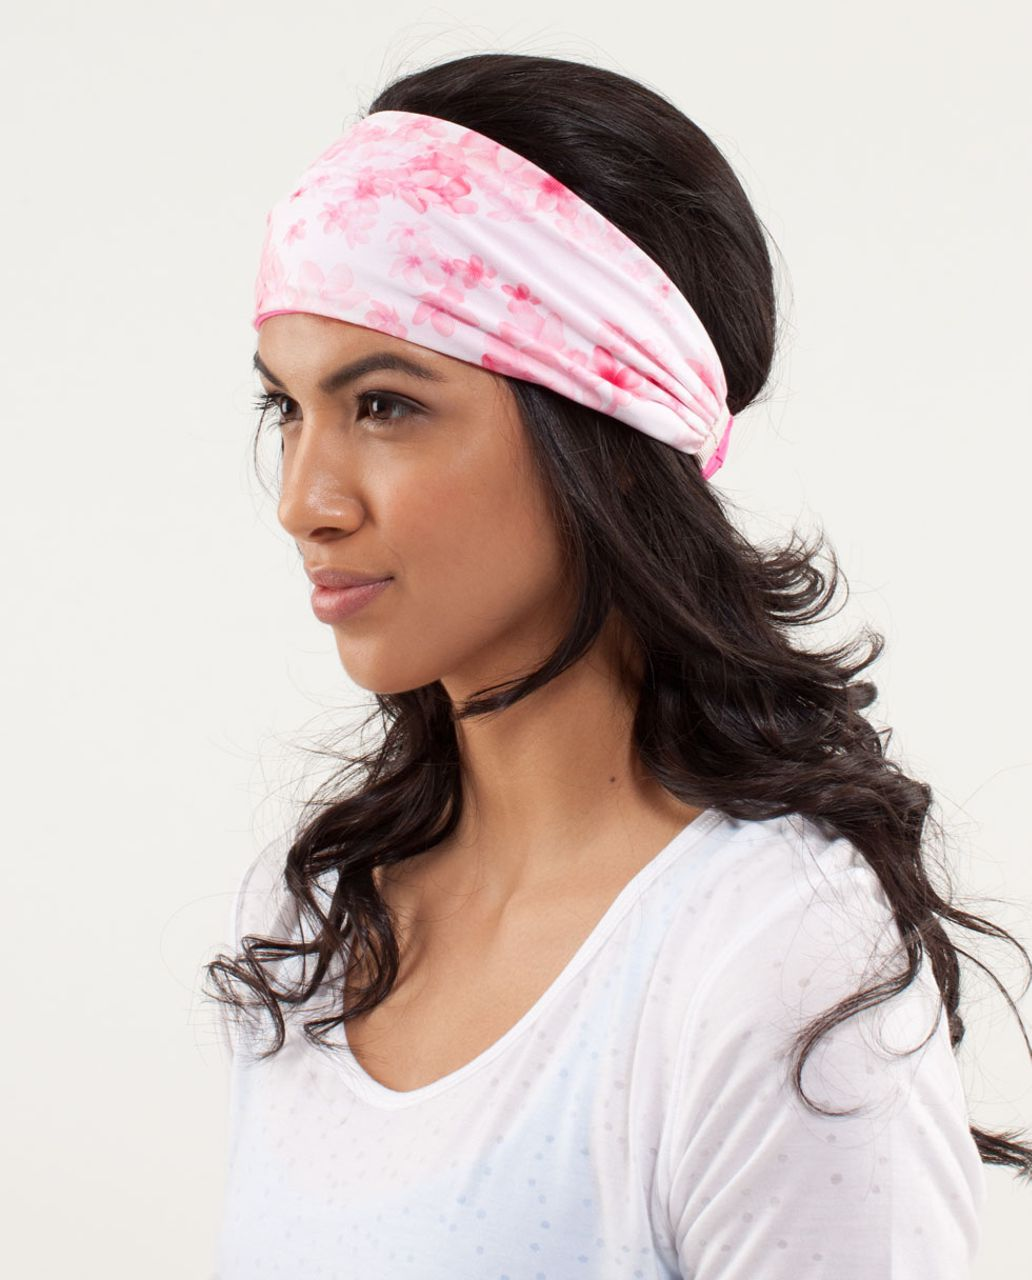 Lululemon Bang Buster Headband *Reversible - Pinkelicious / Frangipani Parfait Pink